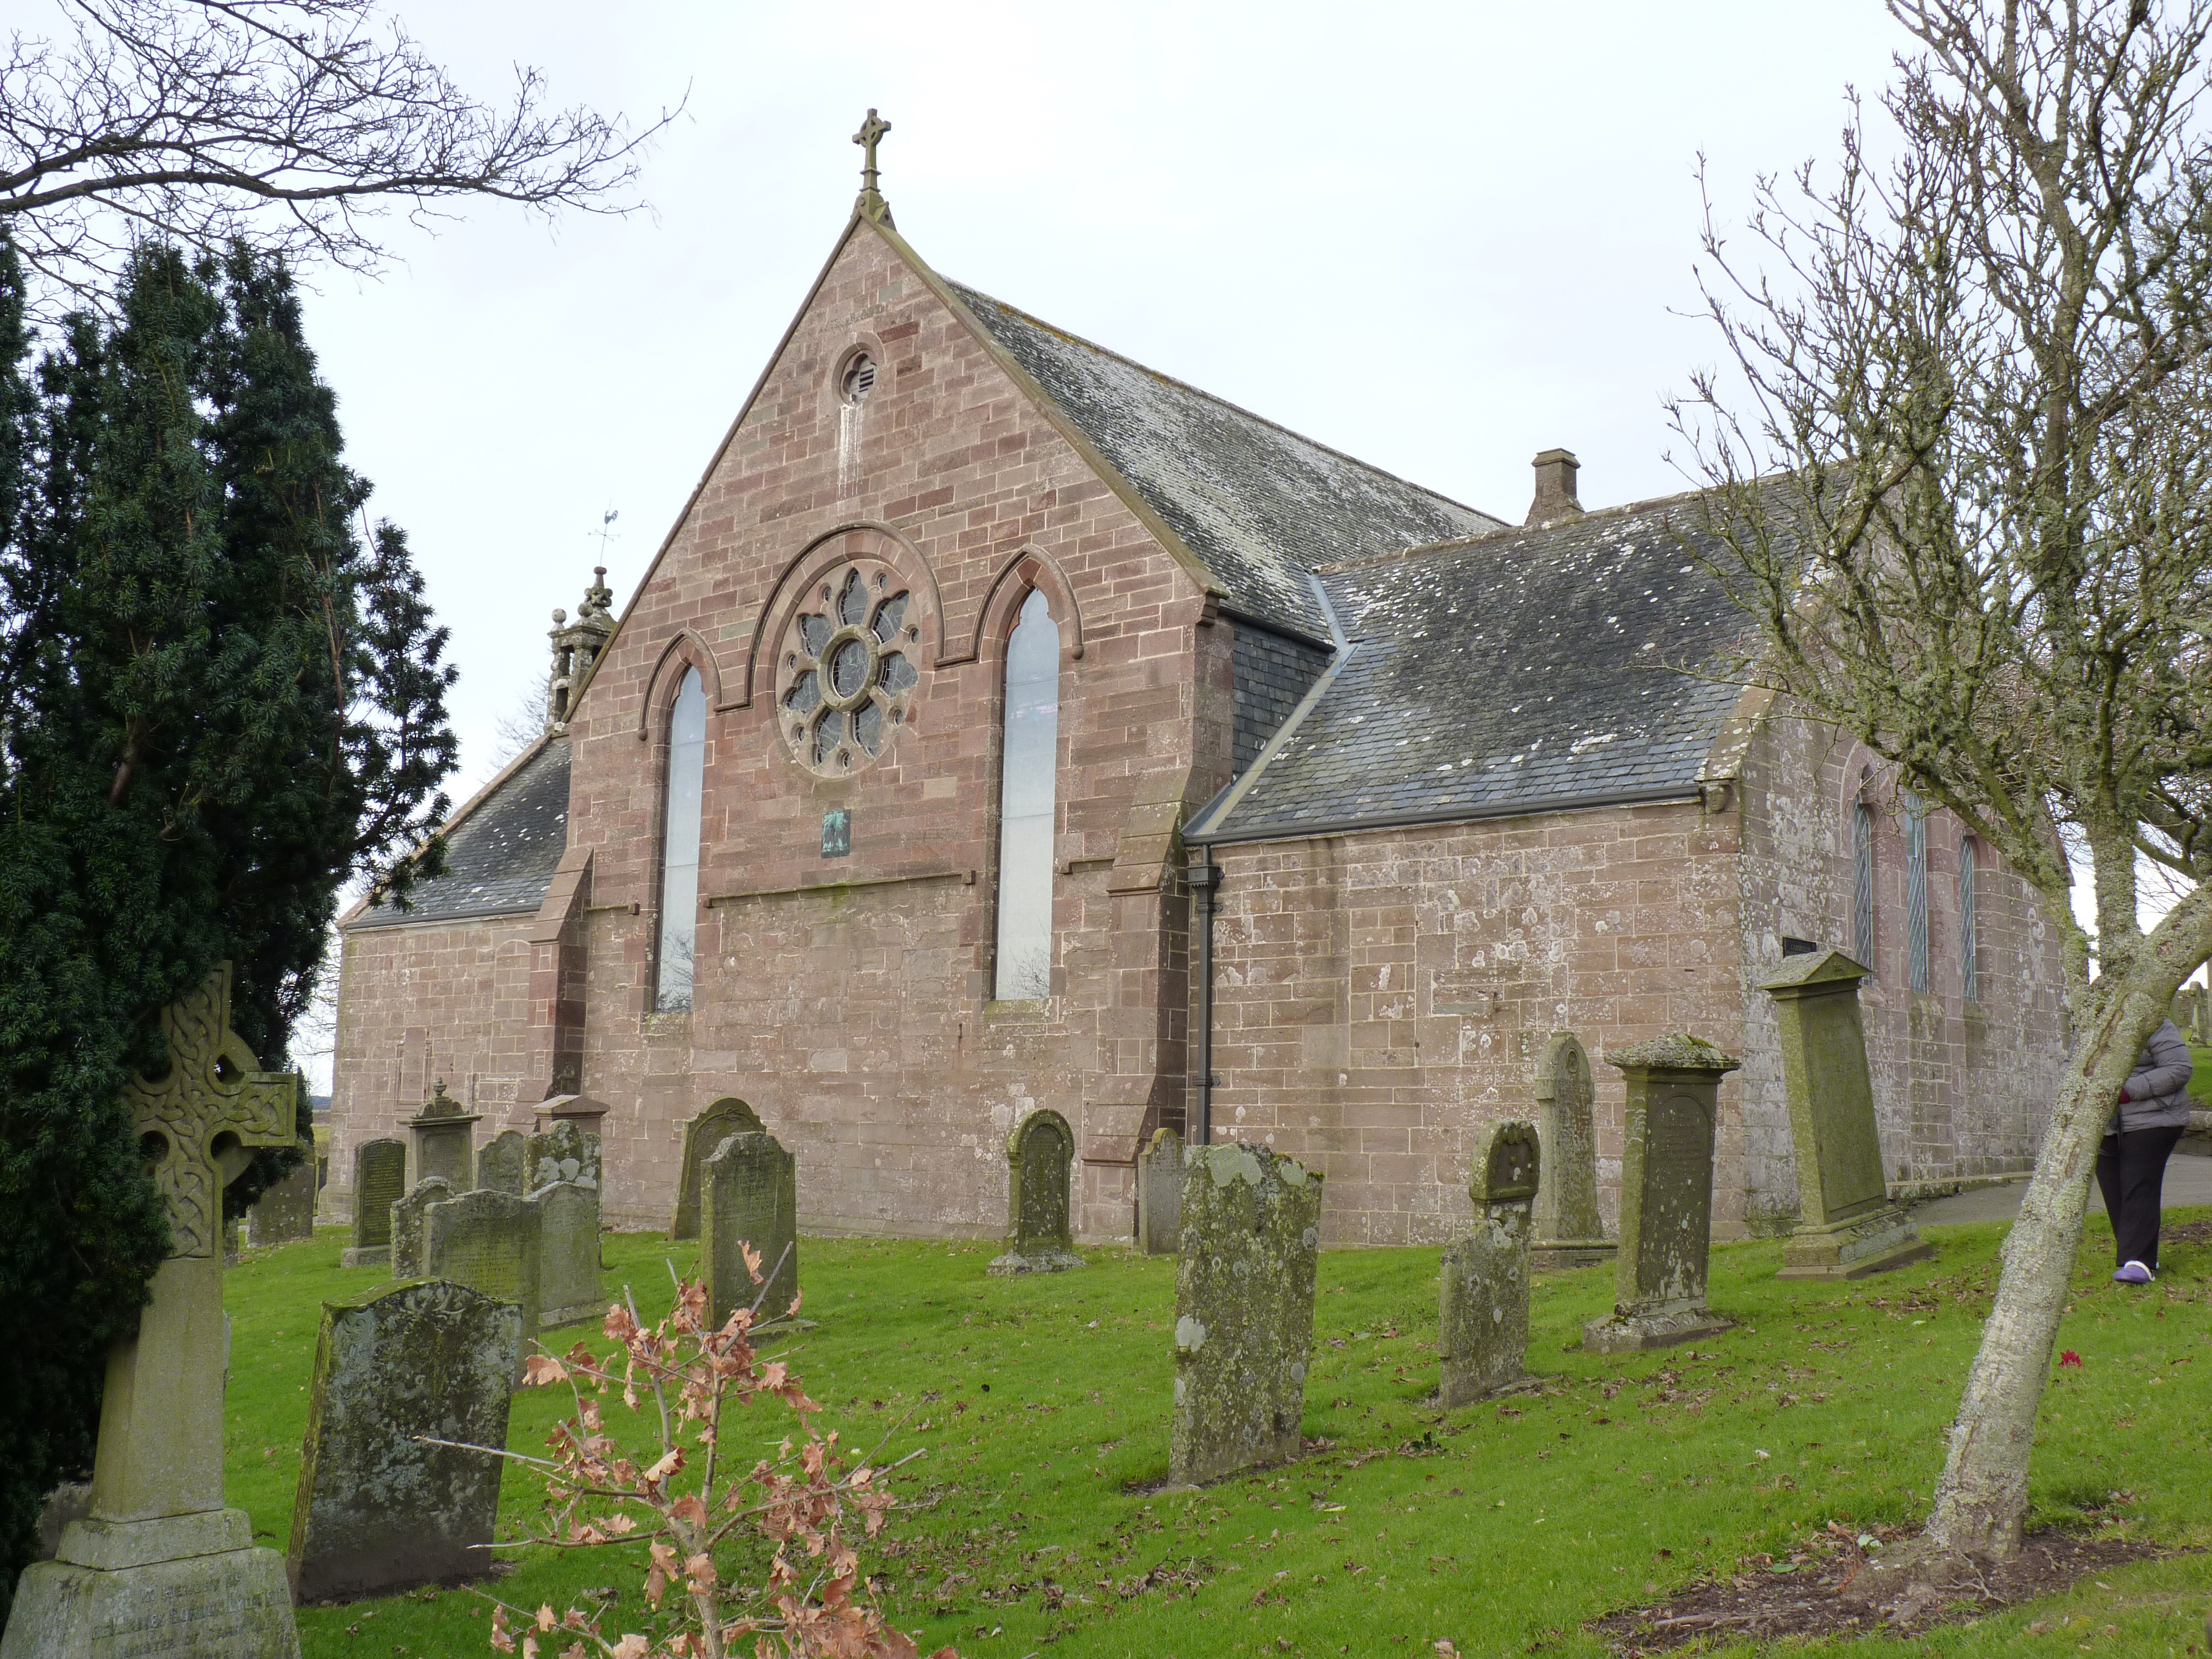 Carmyllie Churchyard in Carmyllie, Angus - Find A Grave Cemetery